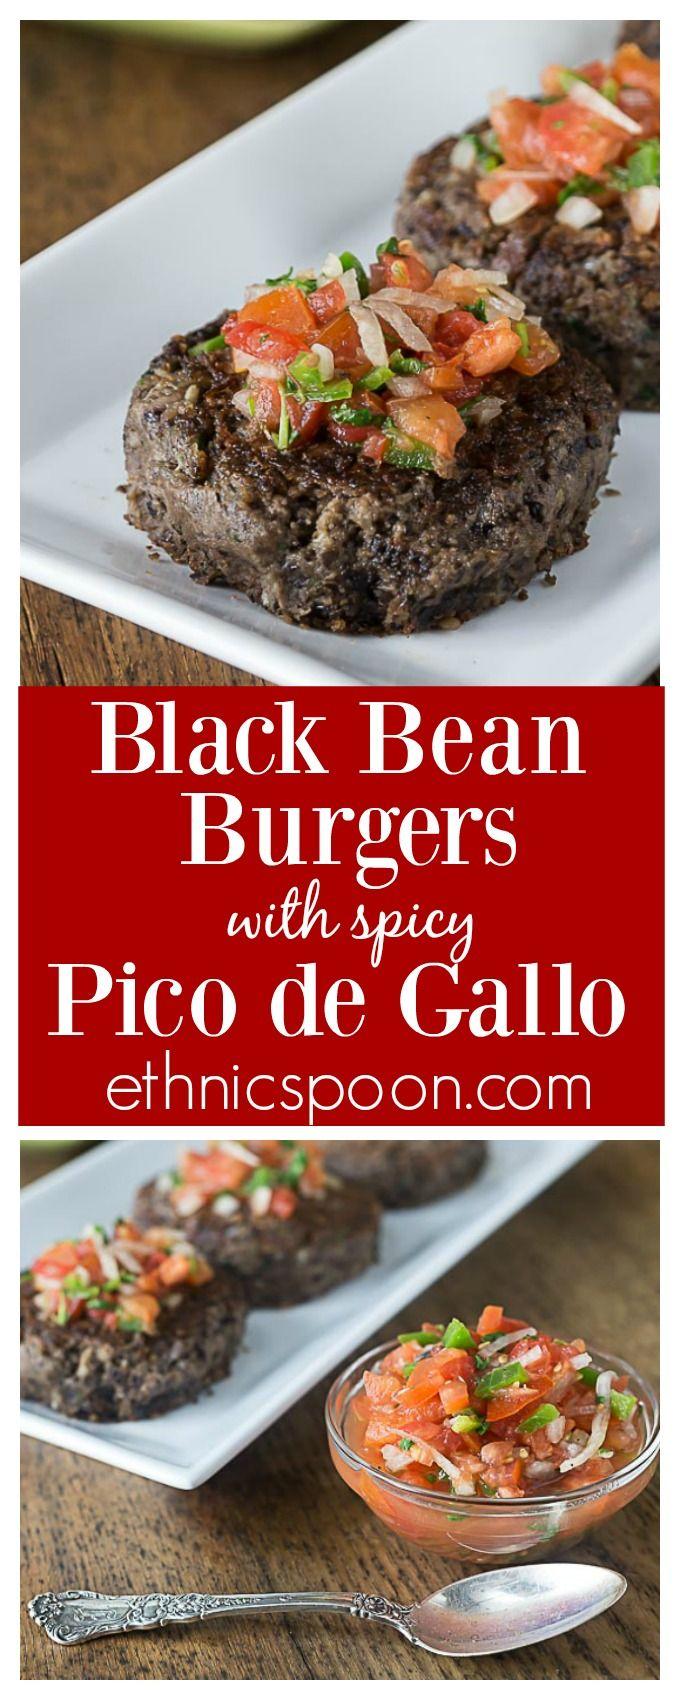 ... Black Bean Burgers on Pinterest | Black Bean Burgers, Bean Burger and